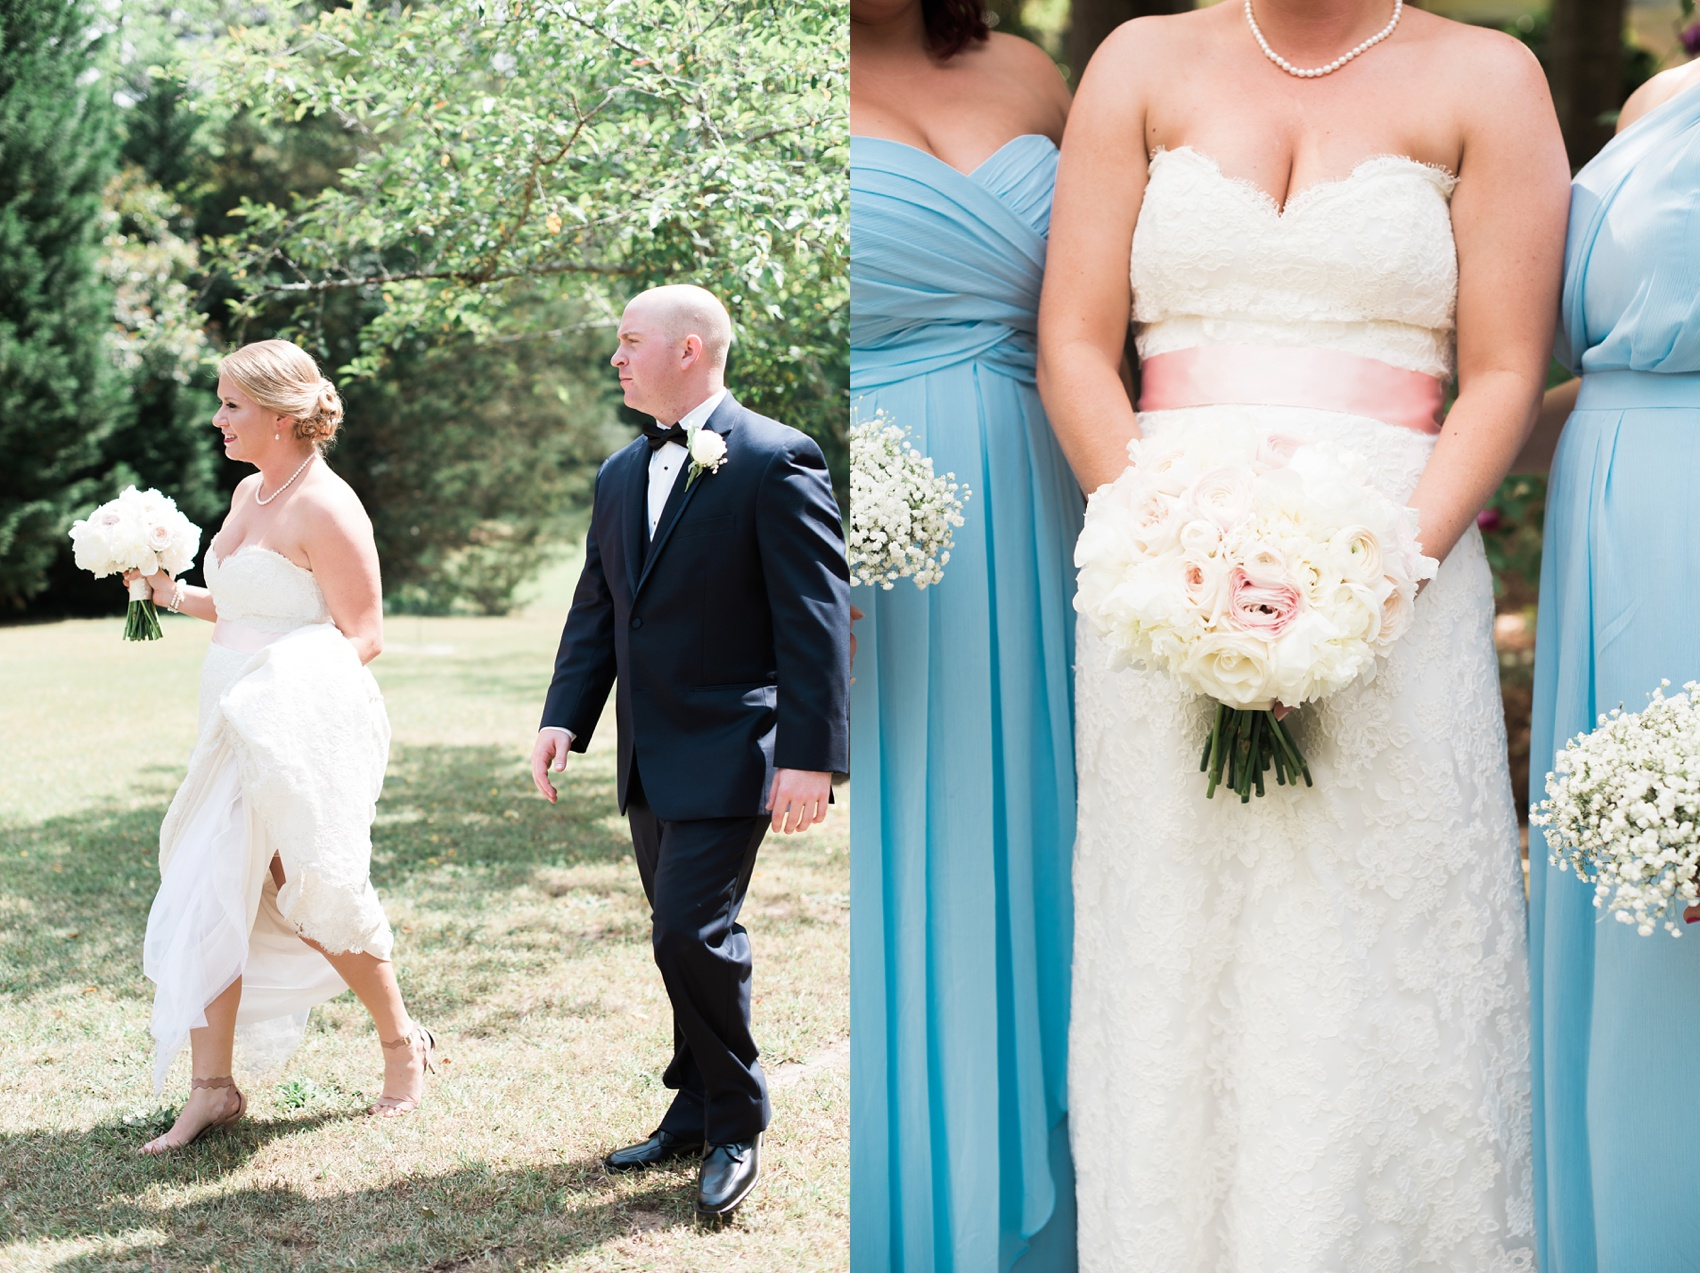 lexington_wedding_photographer_0118.jpg